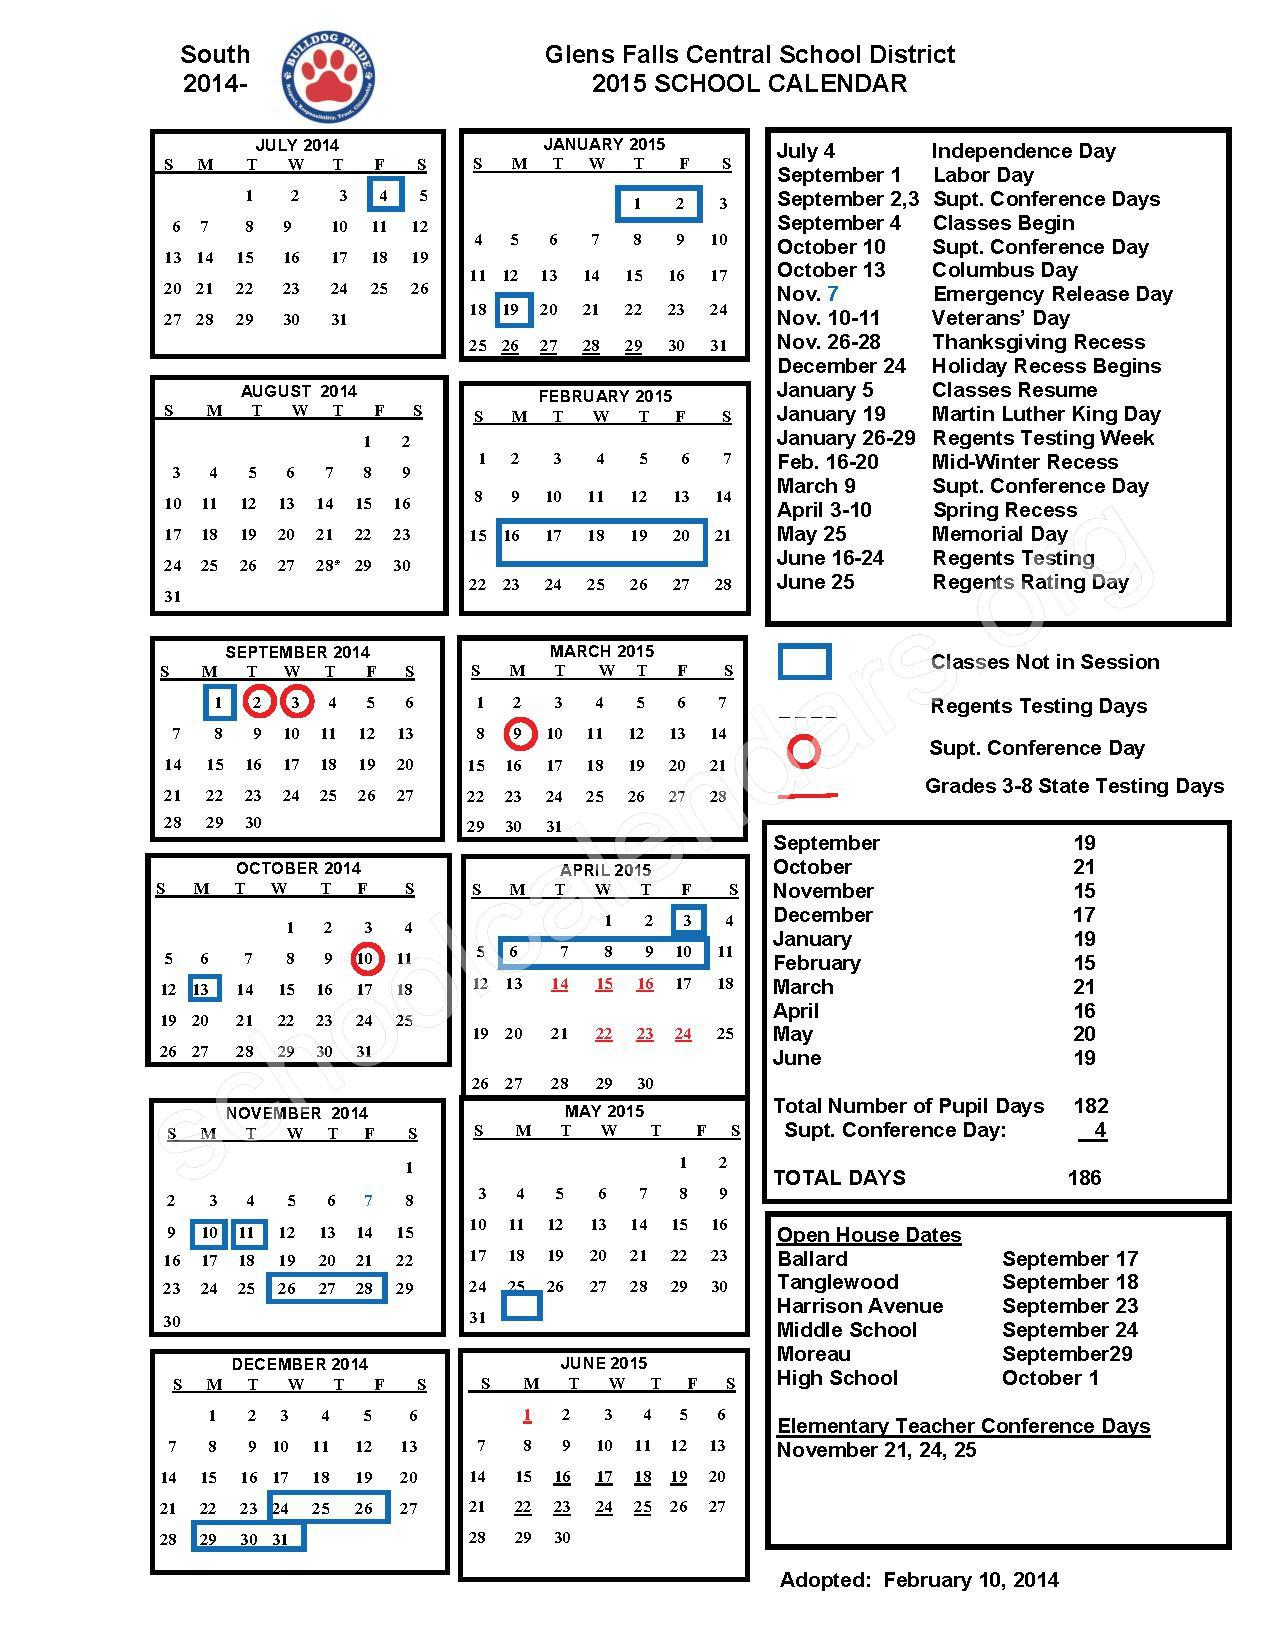 One-page 2014 - 2015 school calendar